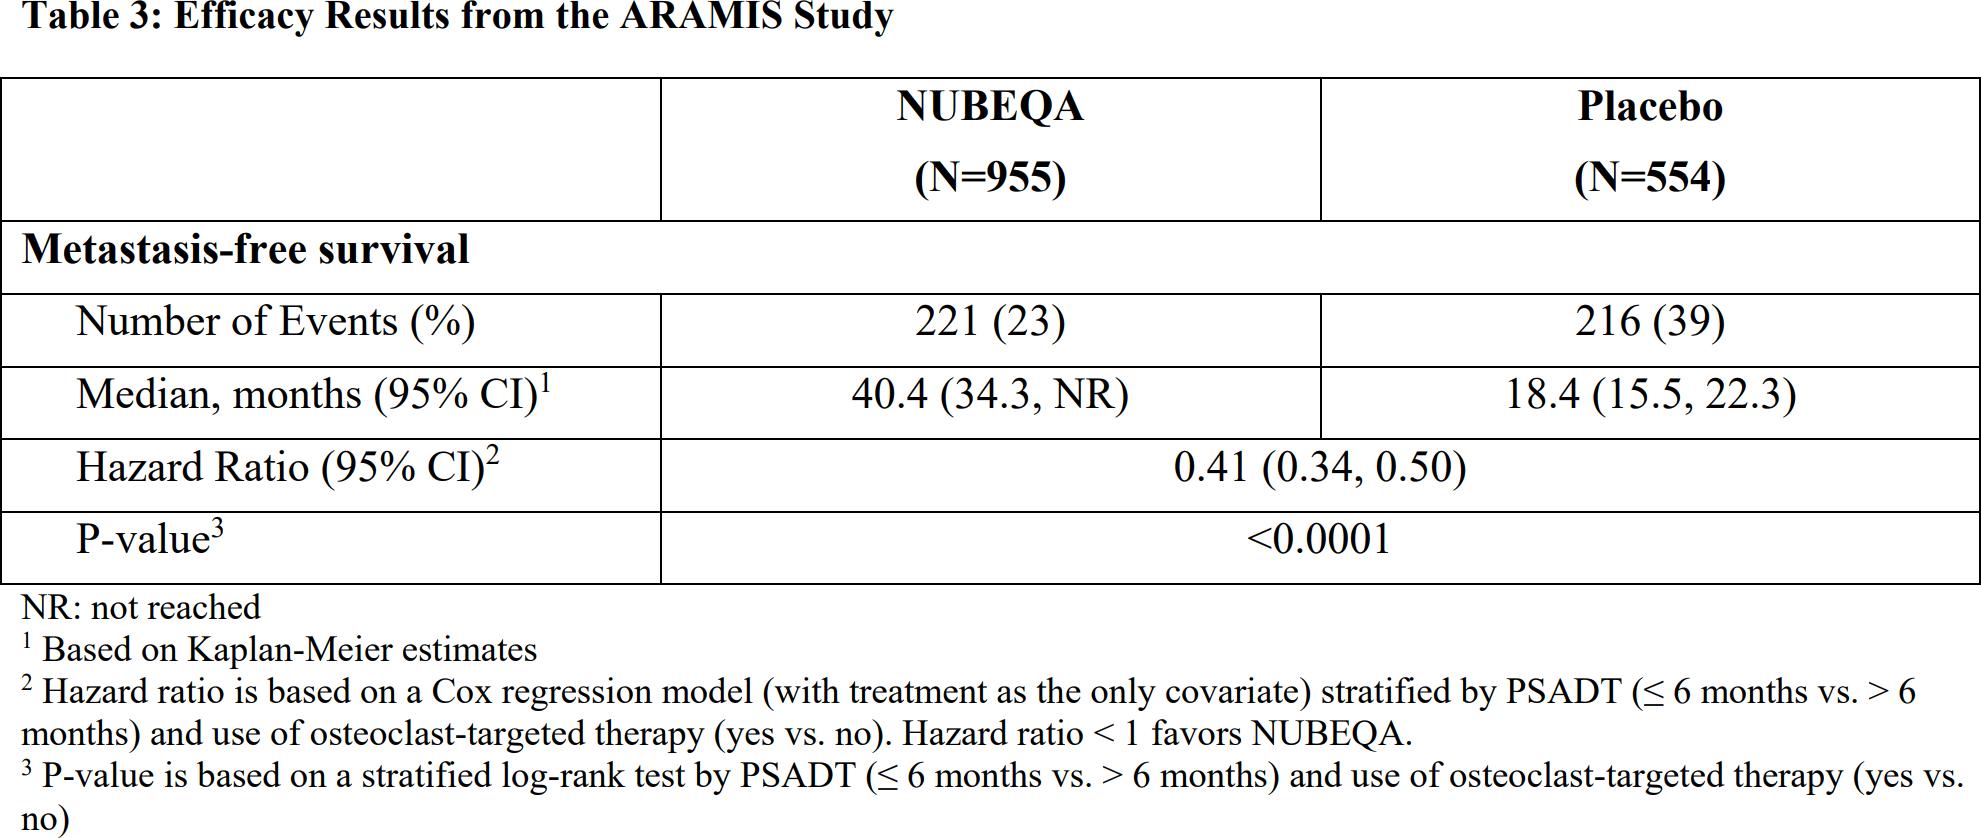 nubeqa clinical trial results 01 - «Нубека»: простатическая звезда Bayer